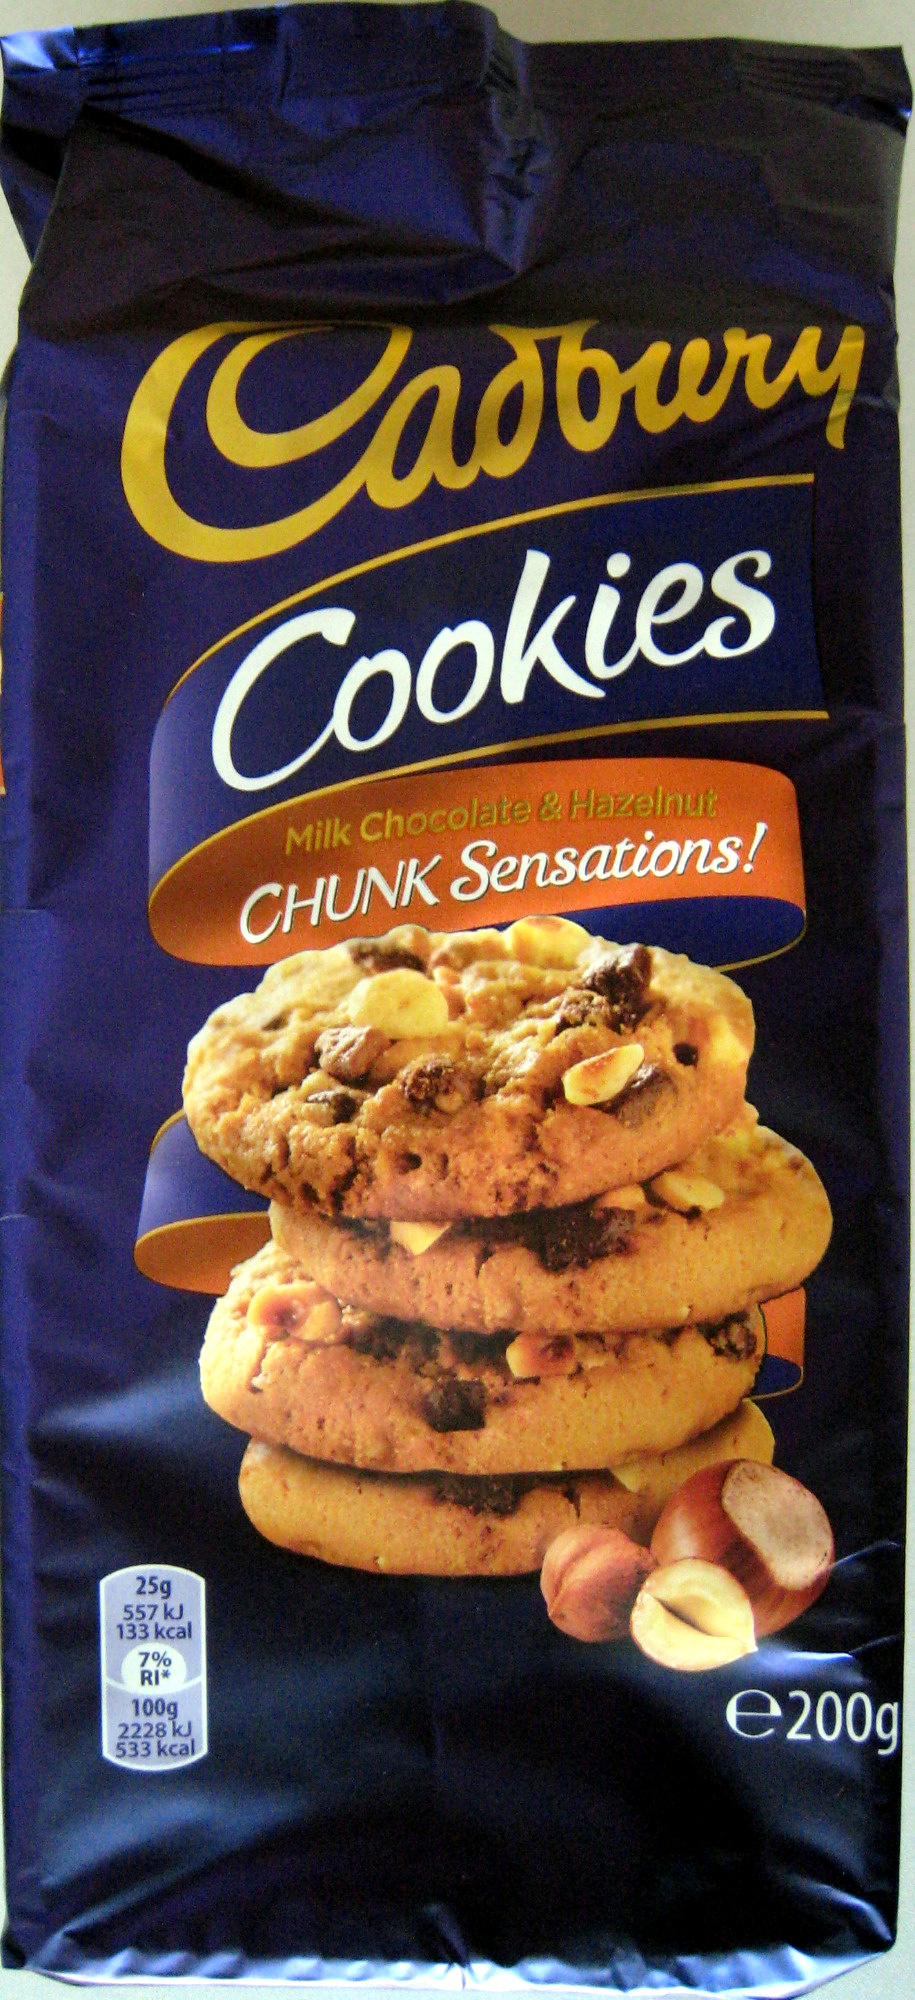 Cookies Milk & Hazelnut Chunk Sensations - Produit - fr